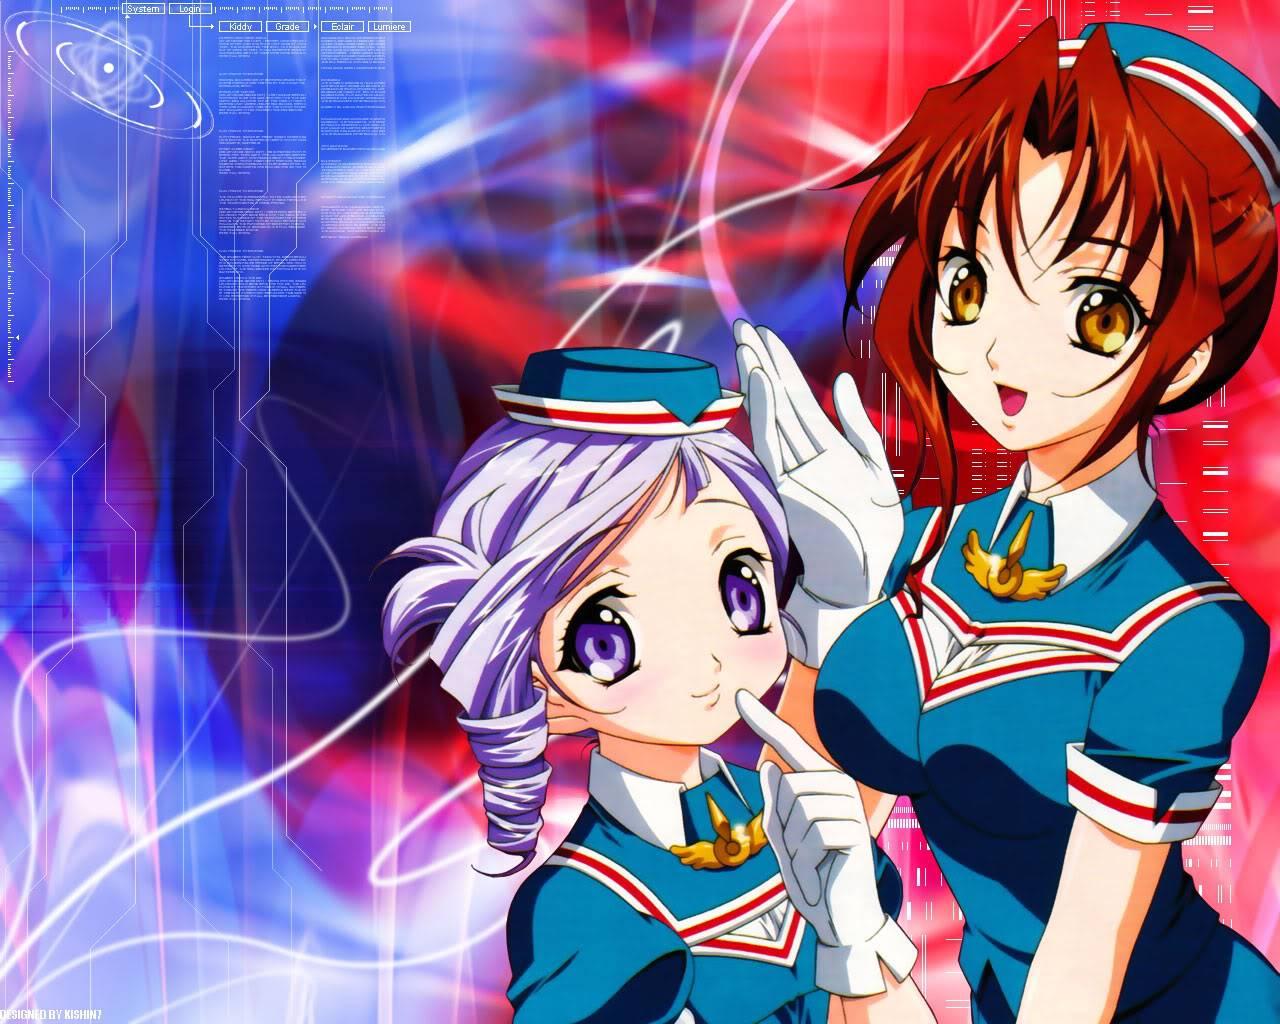 Les plus belles filles (origine : Denchu chan) Kiddygradeworks